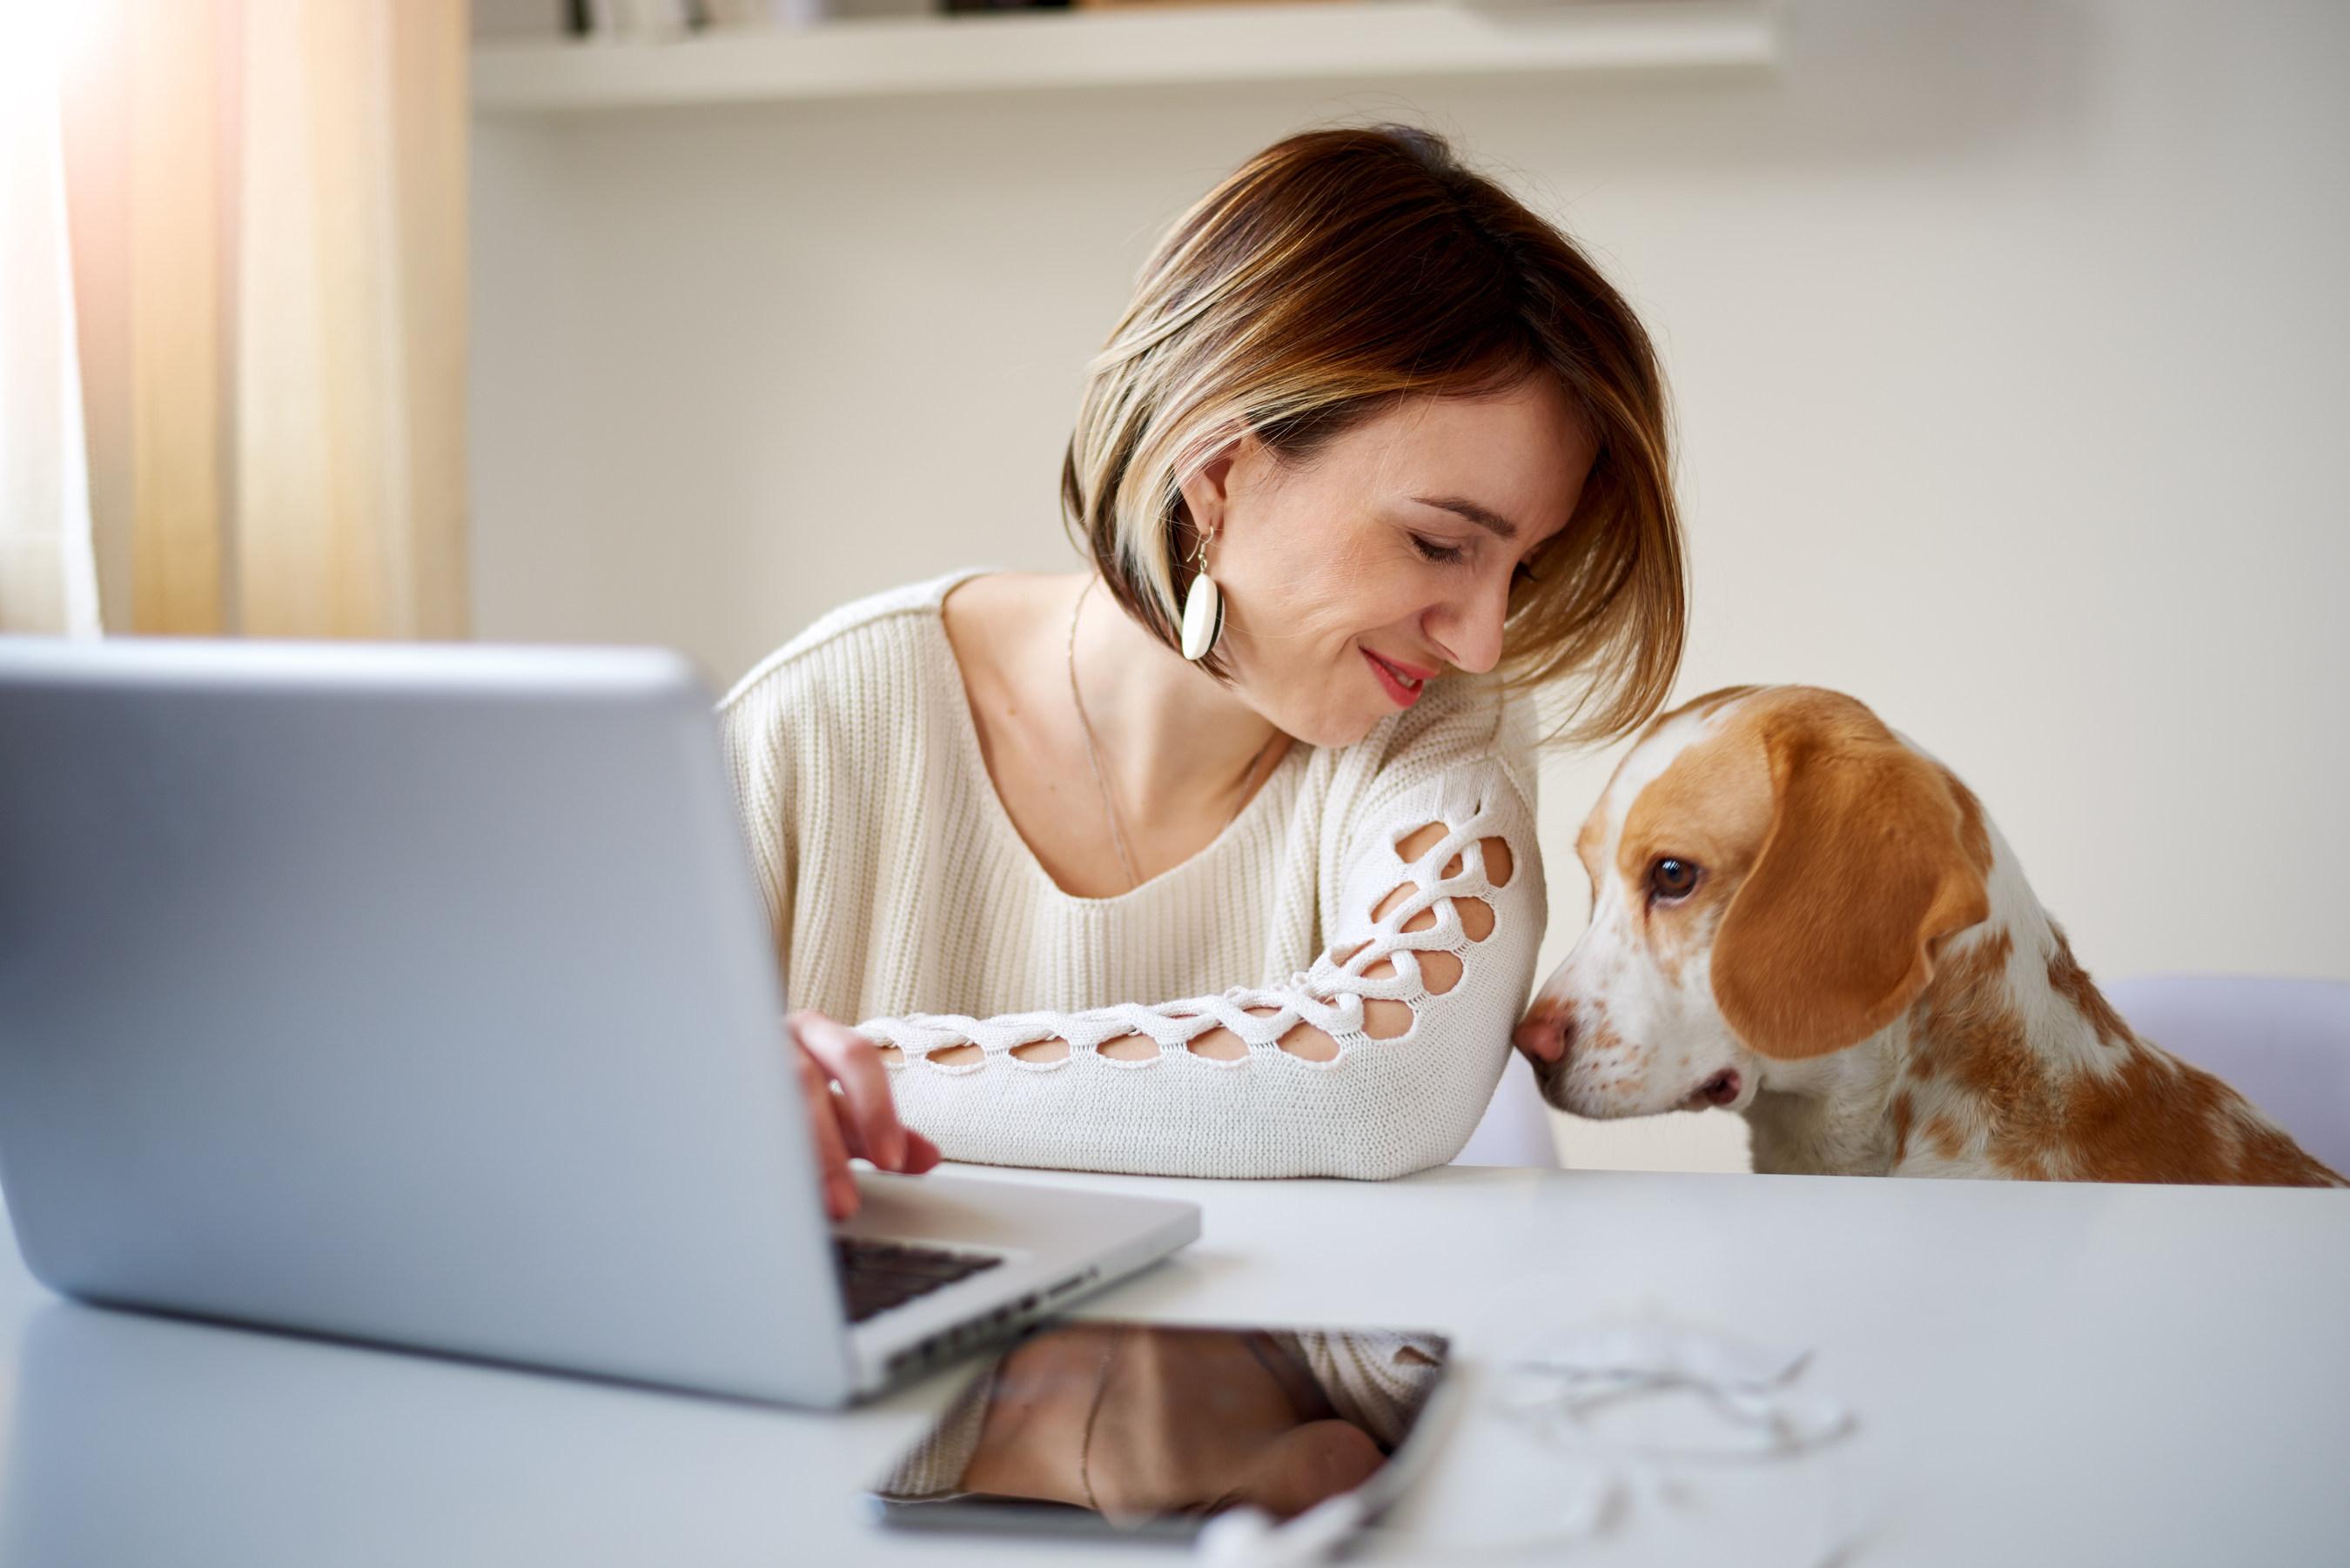 Pet Benefit Solutions Partners with Pets Best Pet Insurance